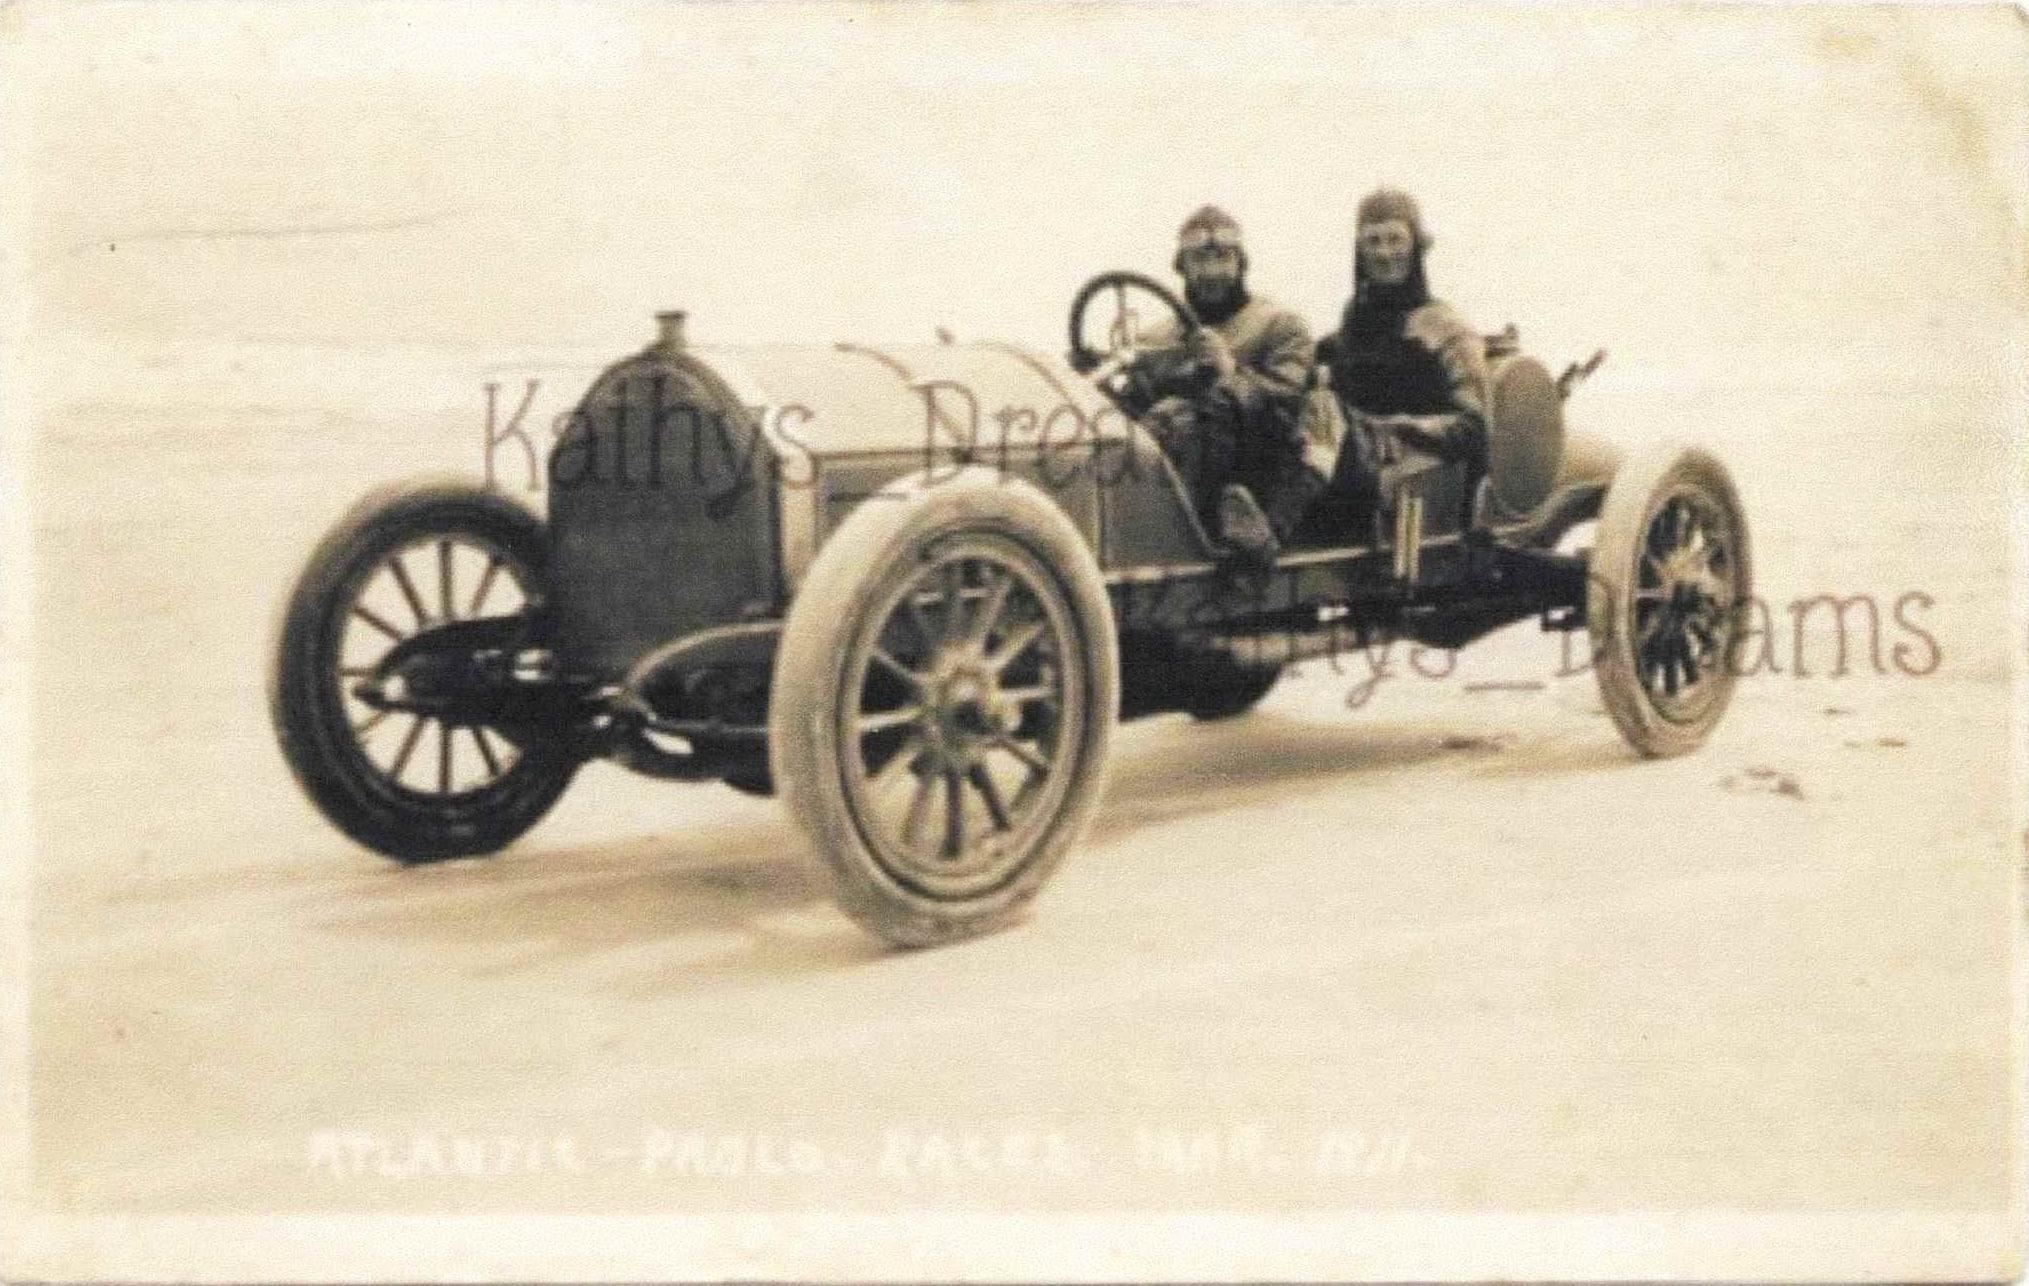 1911 3 ATLANTIC PABLO RACES MAR 1911 RPPC MERCER Hughie Hughes picture of  picture - Chuck's Toyland